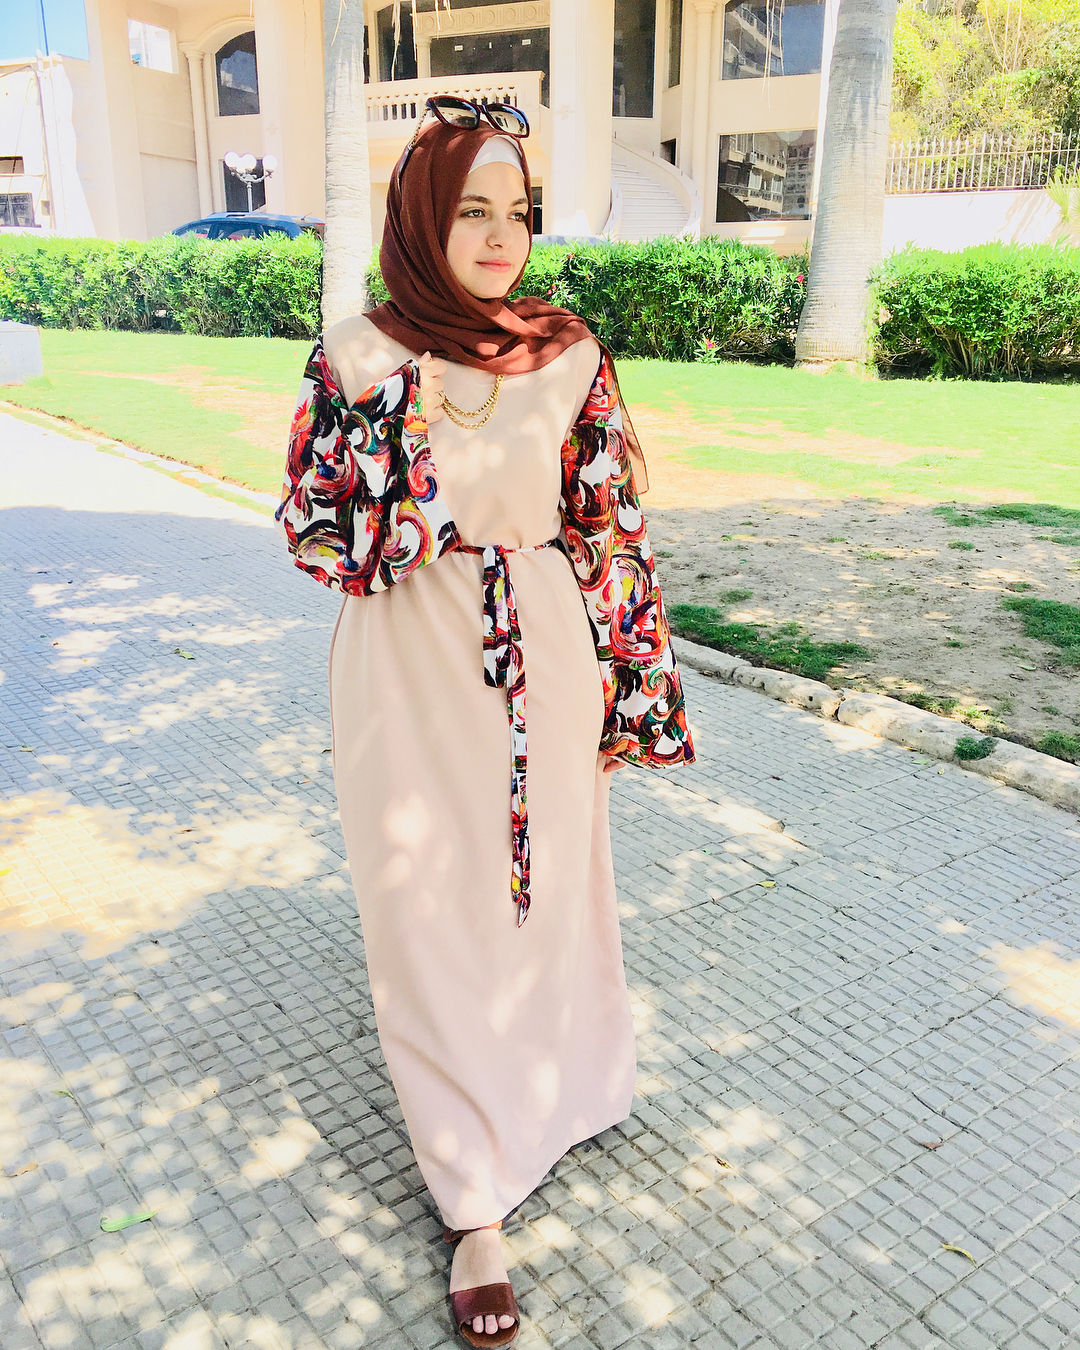 8554c5ccfb565 شاهدي الصور وتعرفي على أفكار مختلفة لارتداء التنانير والفساتين بأناقة مع  مدونة الموضة آية فوزي.